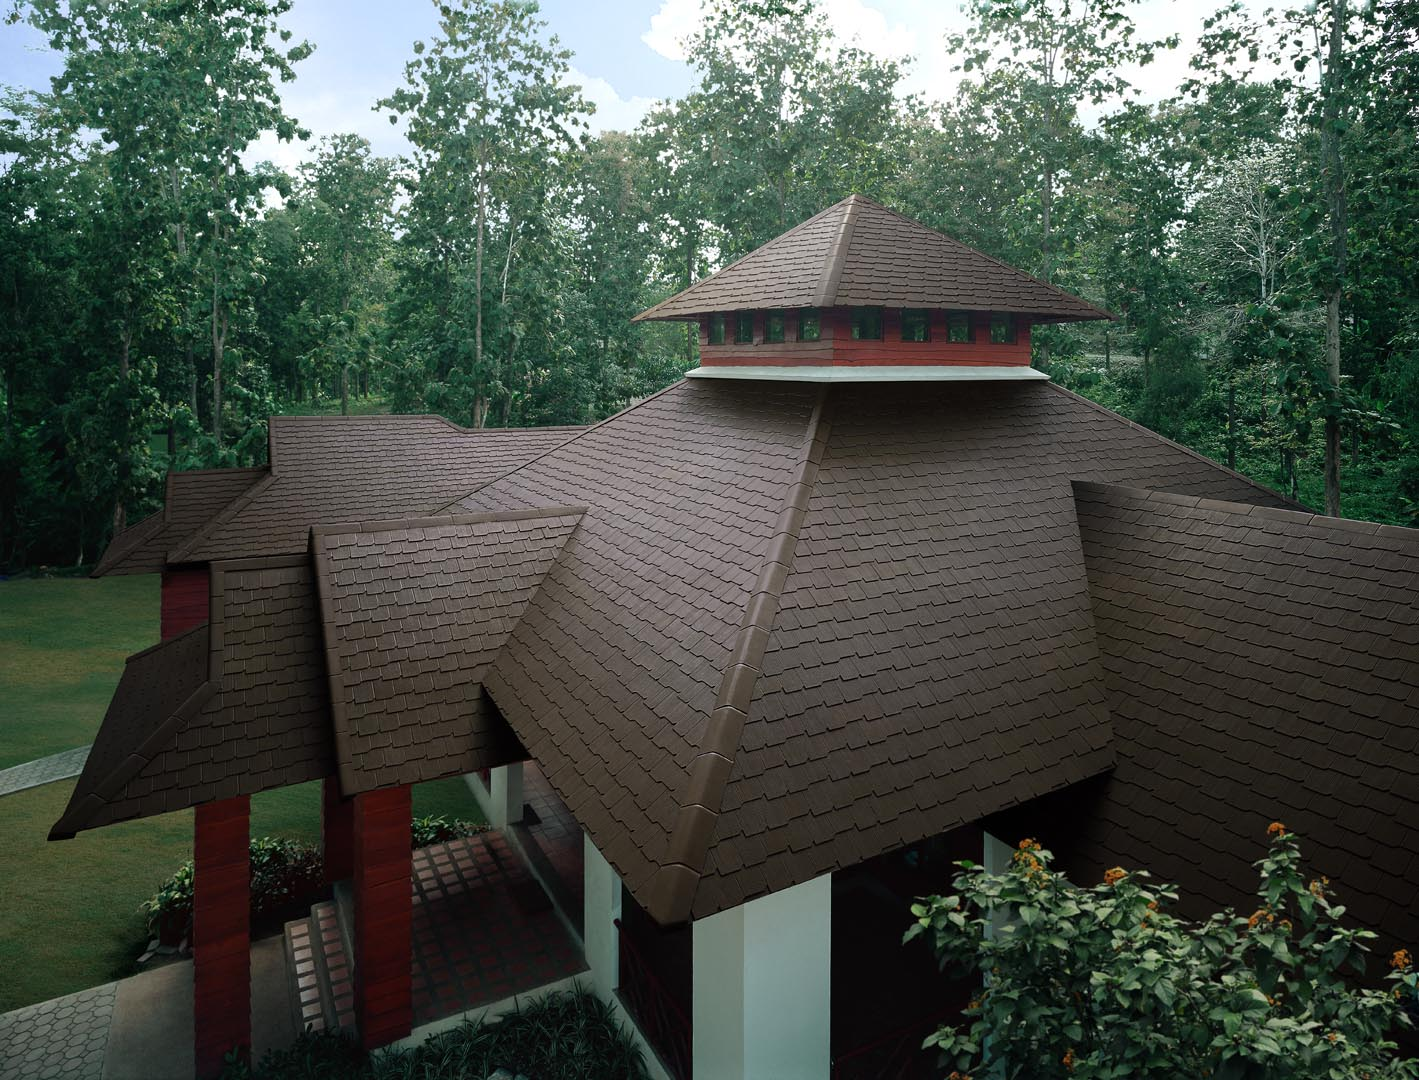 SCG-Fiber-Cement-Roof-Ayara-Timber-Grain-Hazel-Brown-site-reference